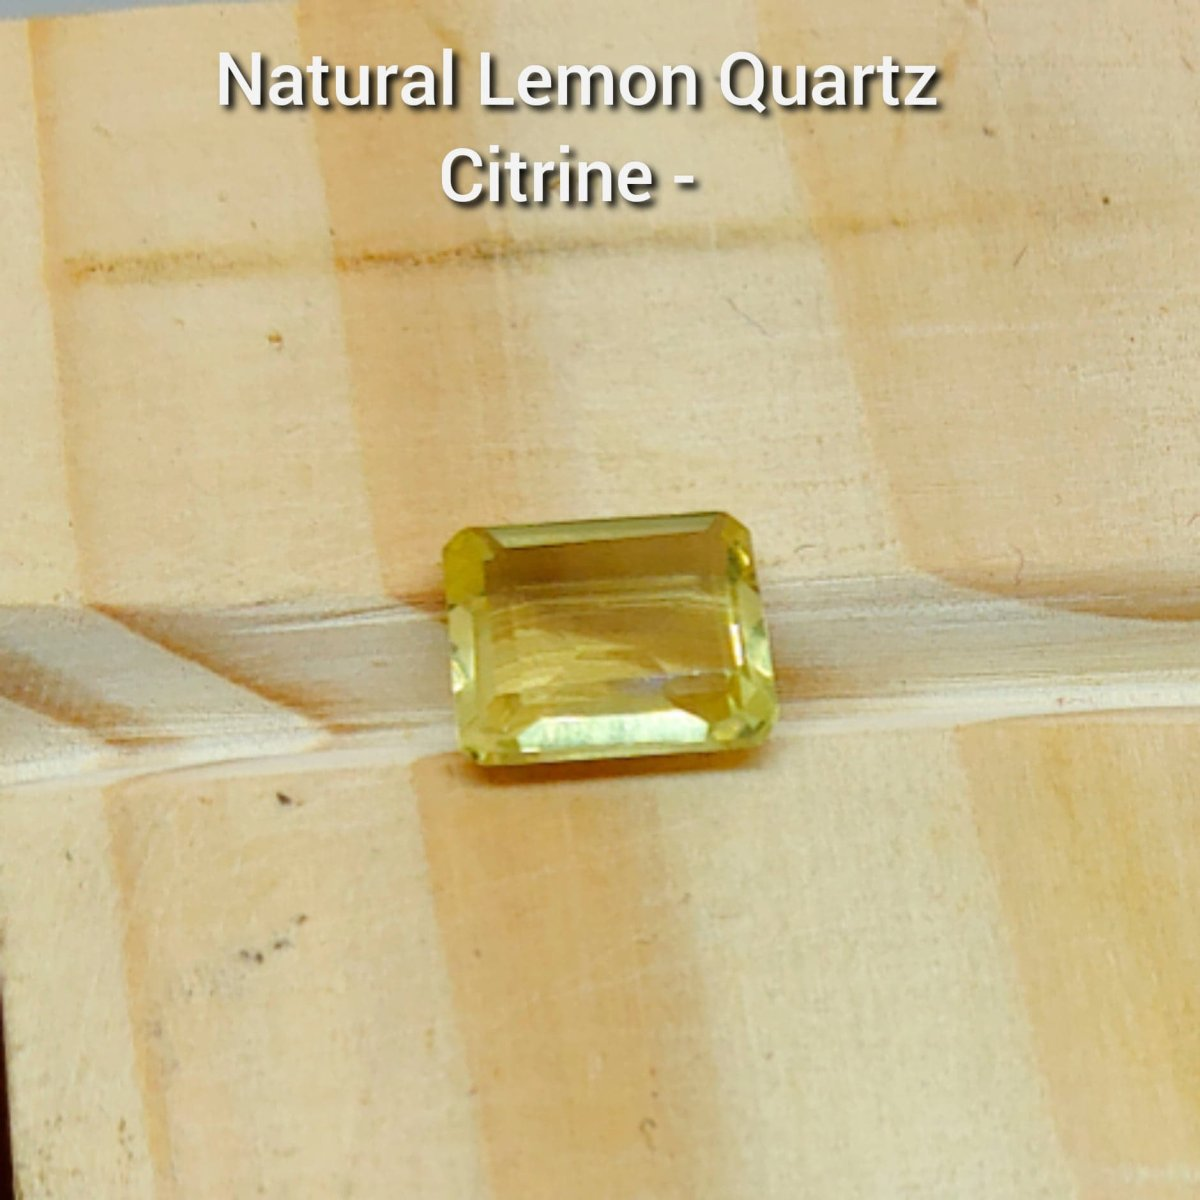 Natural LEmon Quartz - Citrine - Buy Gemstones online in Pakistan